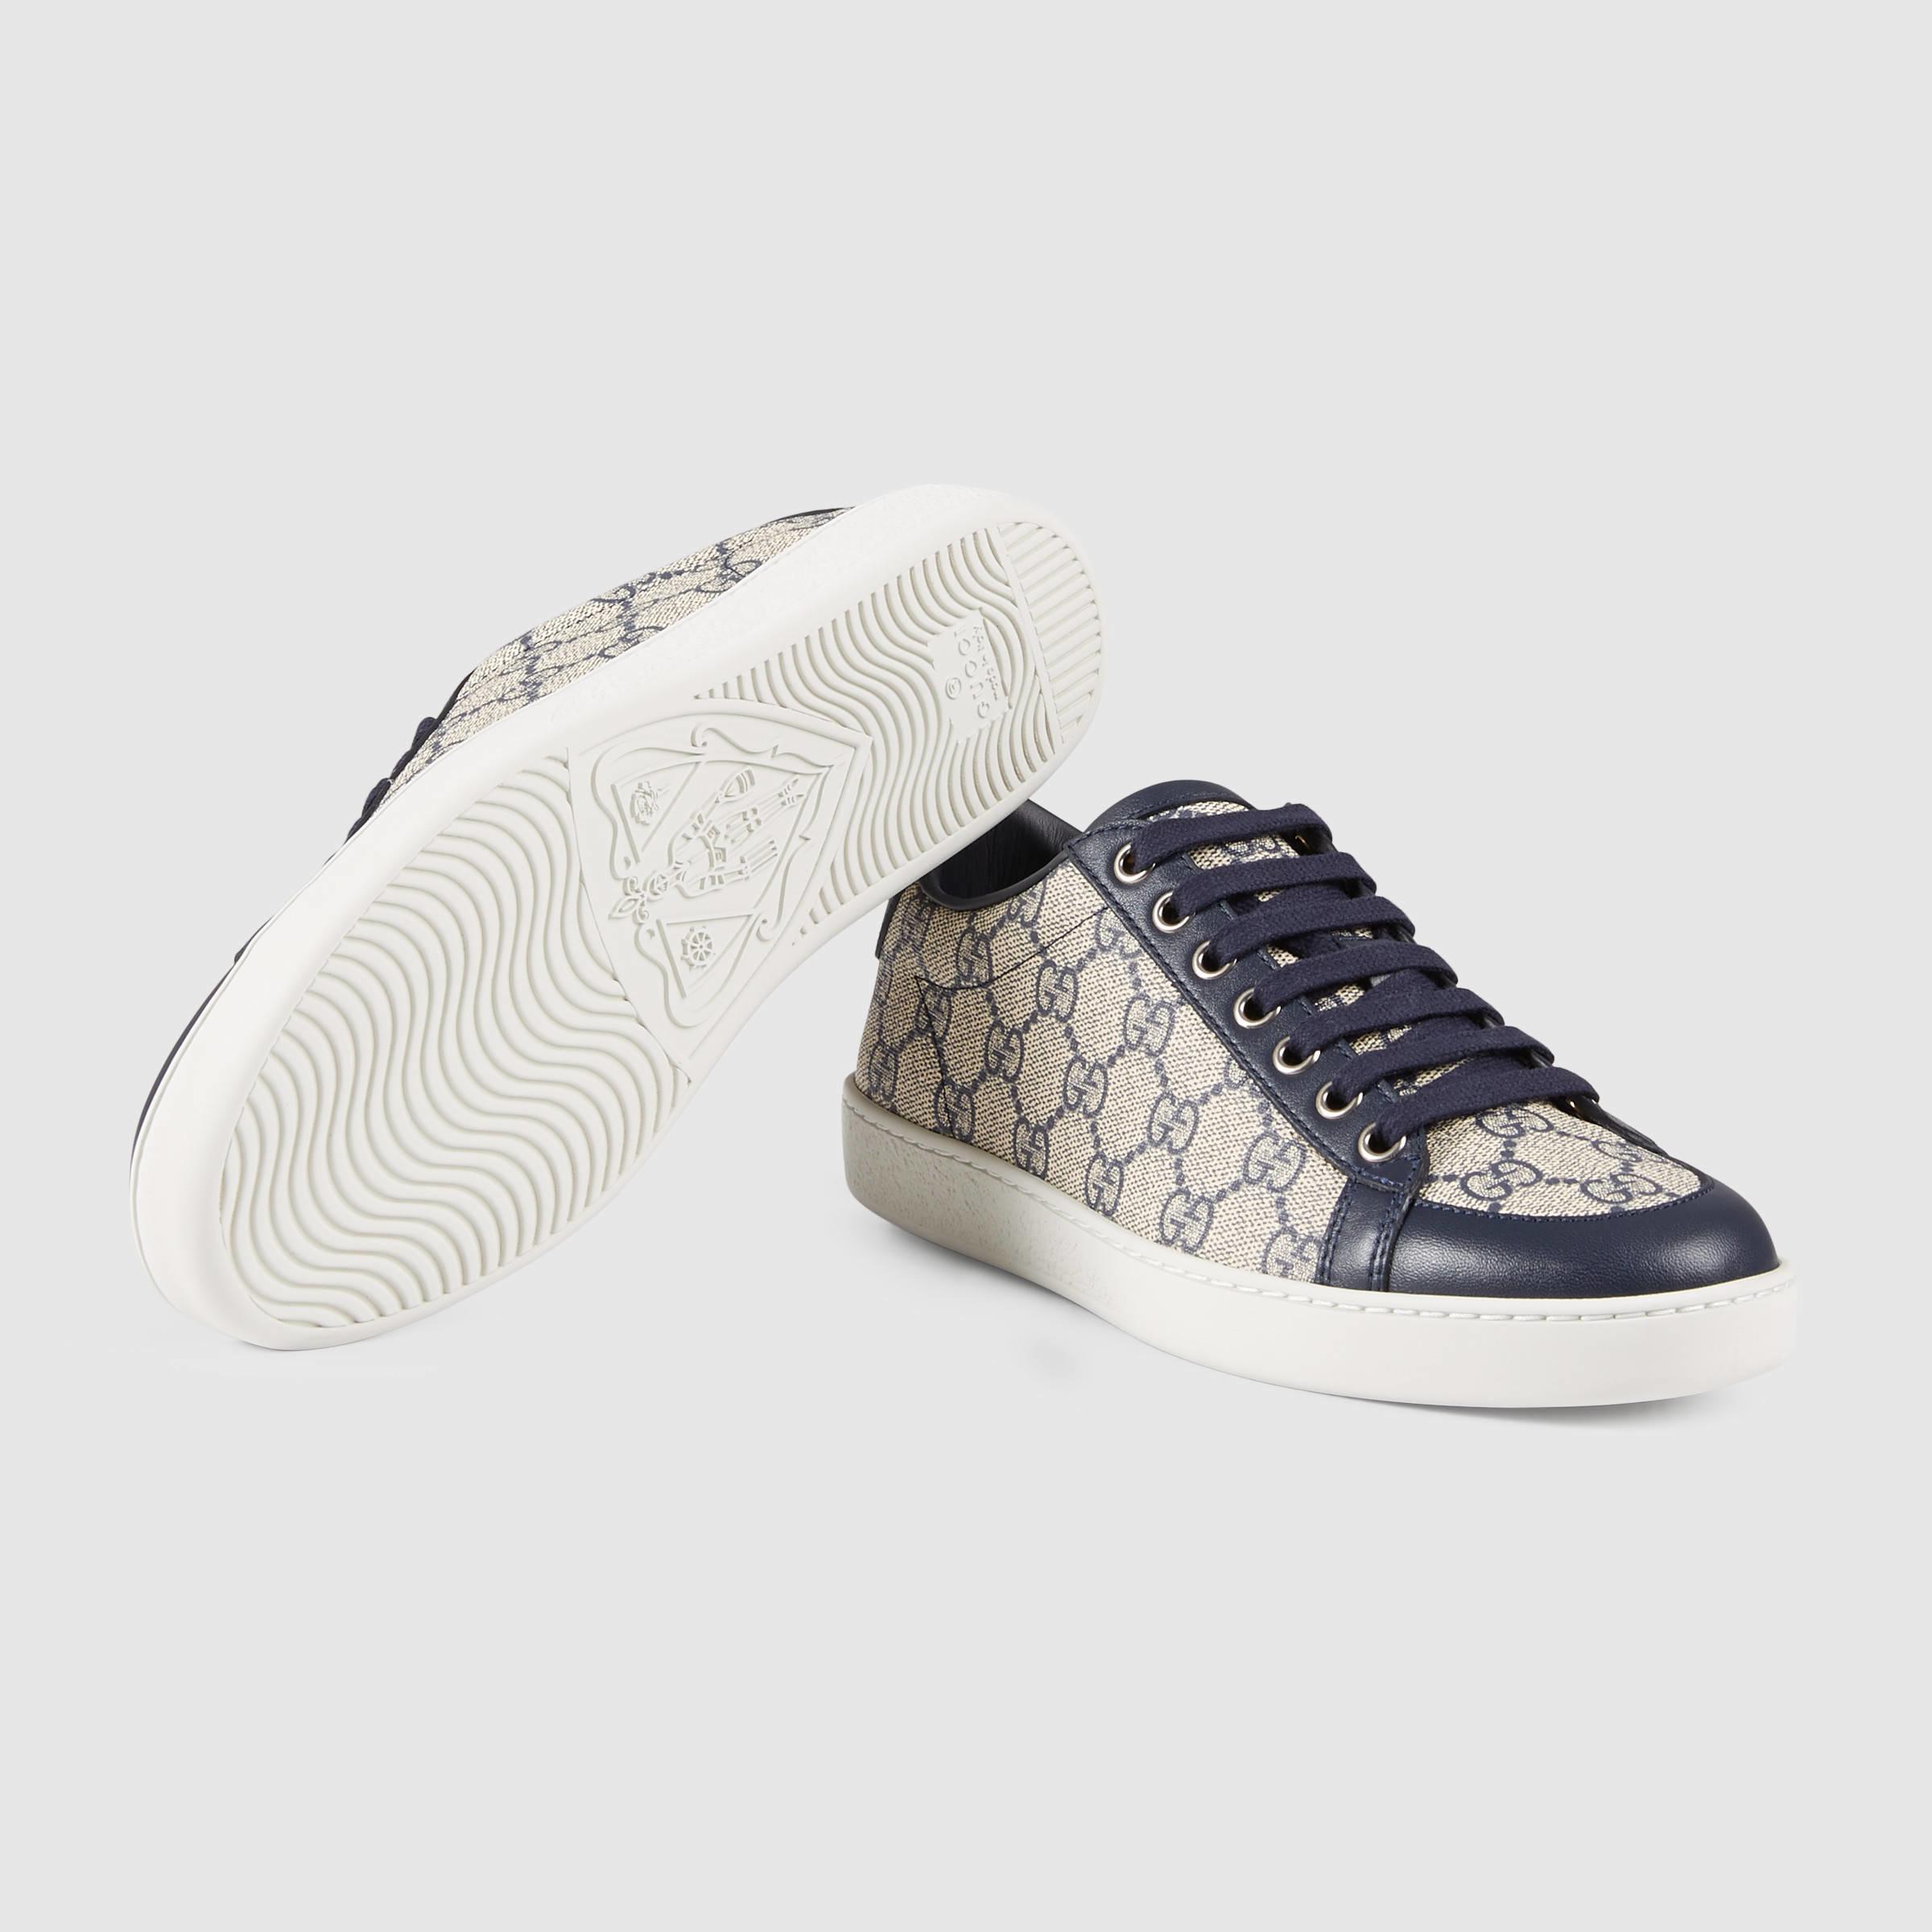 077f77f1069 Lyst - Gucci Brooklyn GG Supreme Sneaker in Blue